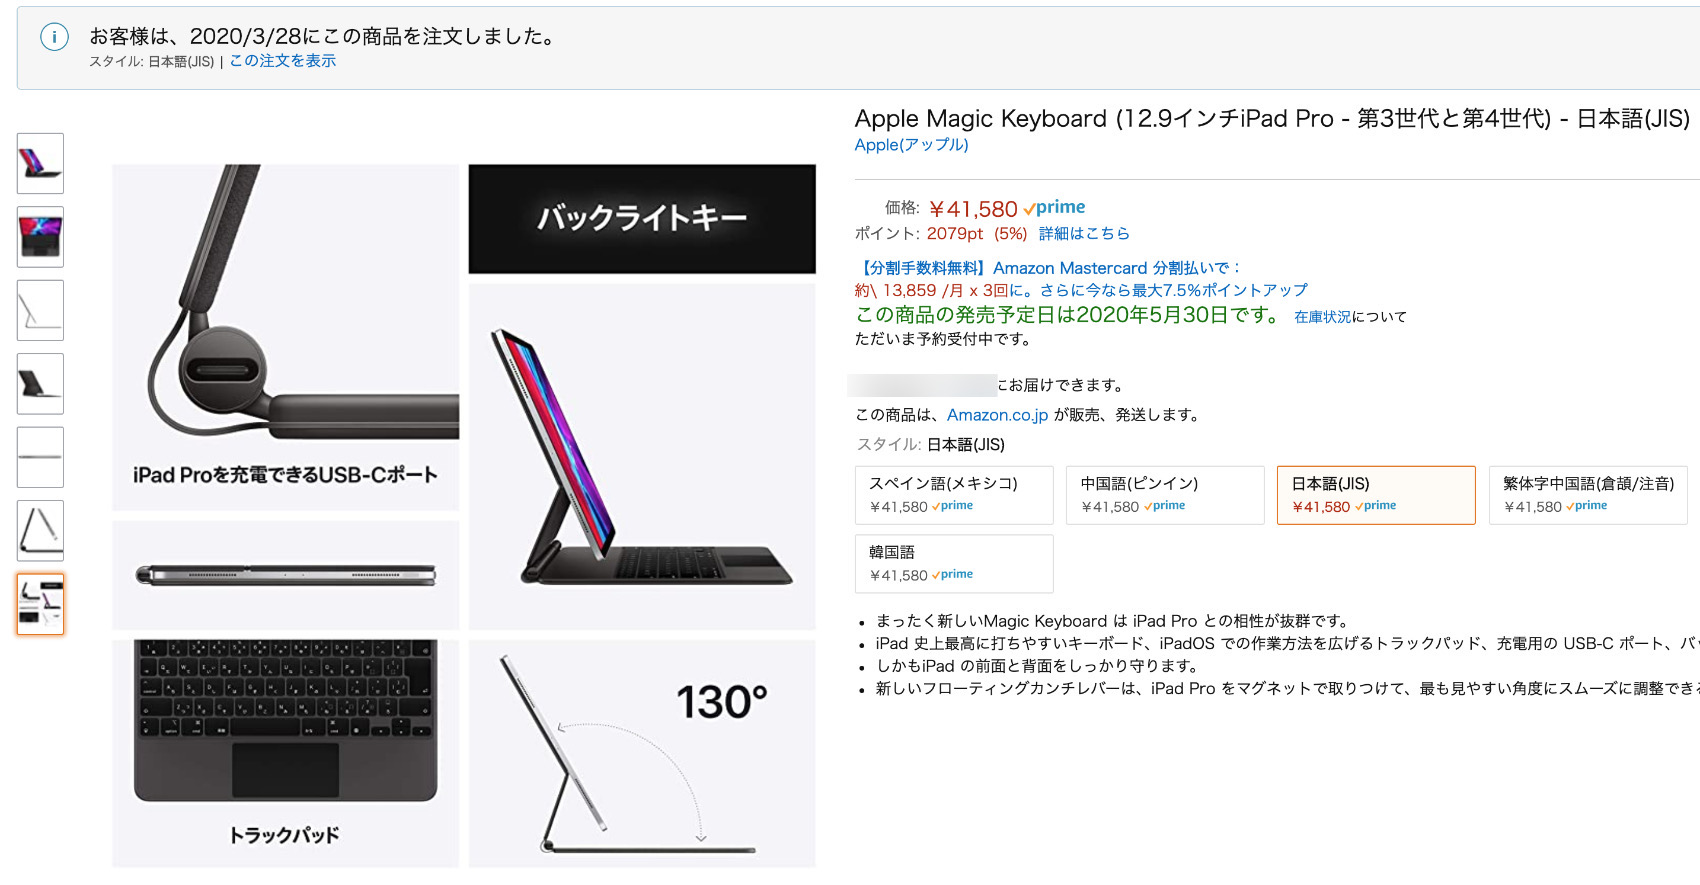 Apple Magic Keyboard (12.9インチiPad Pro - 第3世代と第4世代) - 日本語(JIS)